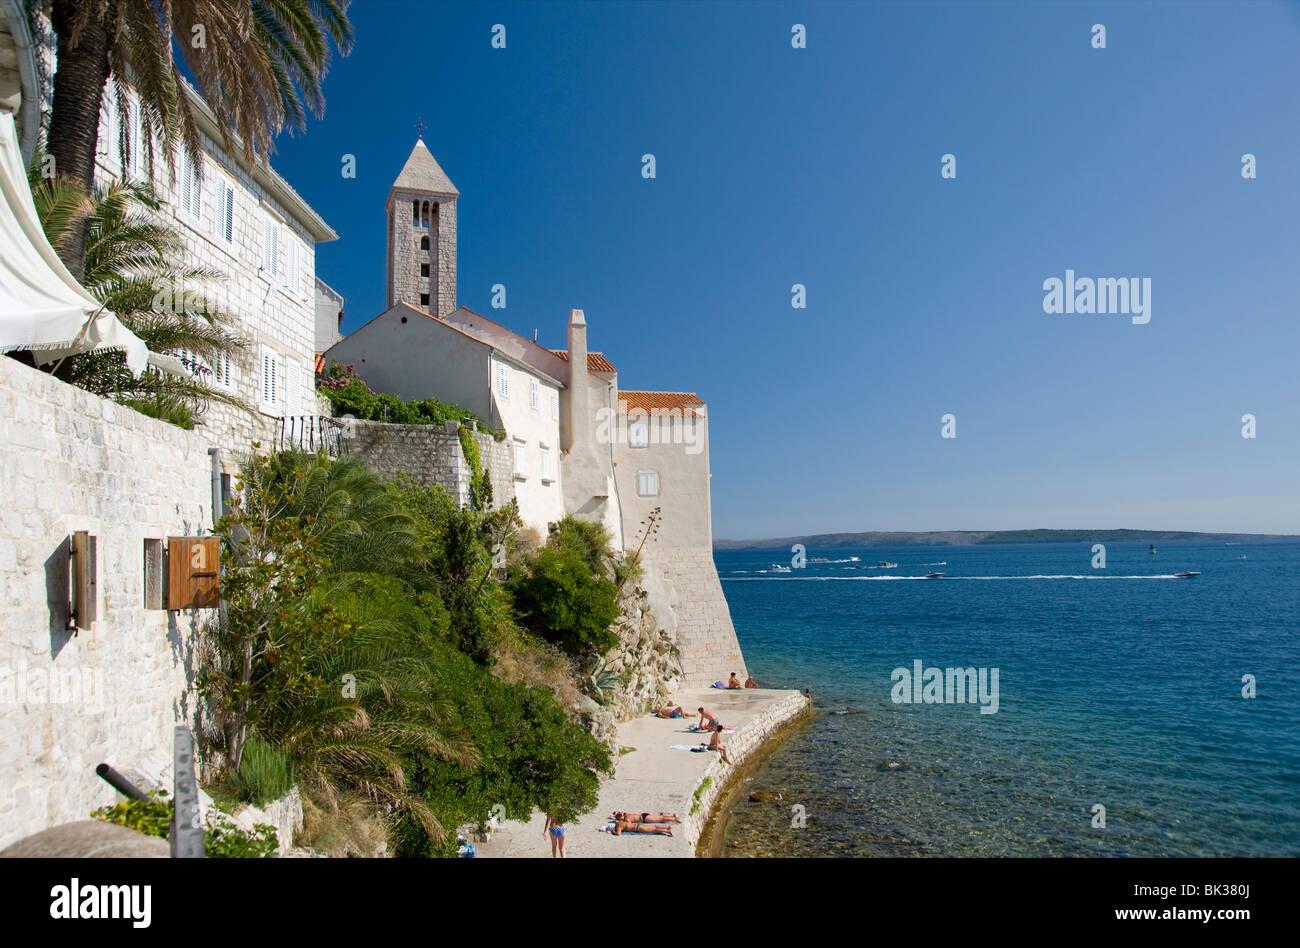 Swimmers and sunbathers on rock wall next to Rab Town, island of Rab, Kvarner region, Croatia, Europe - Stock Image